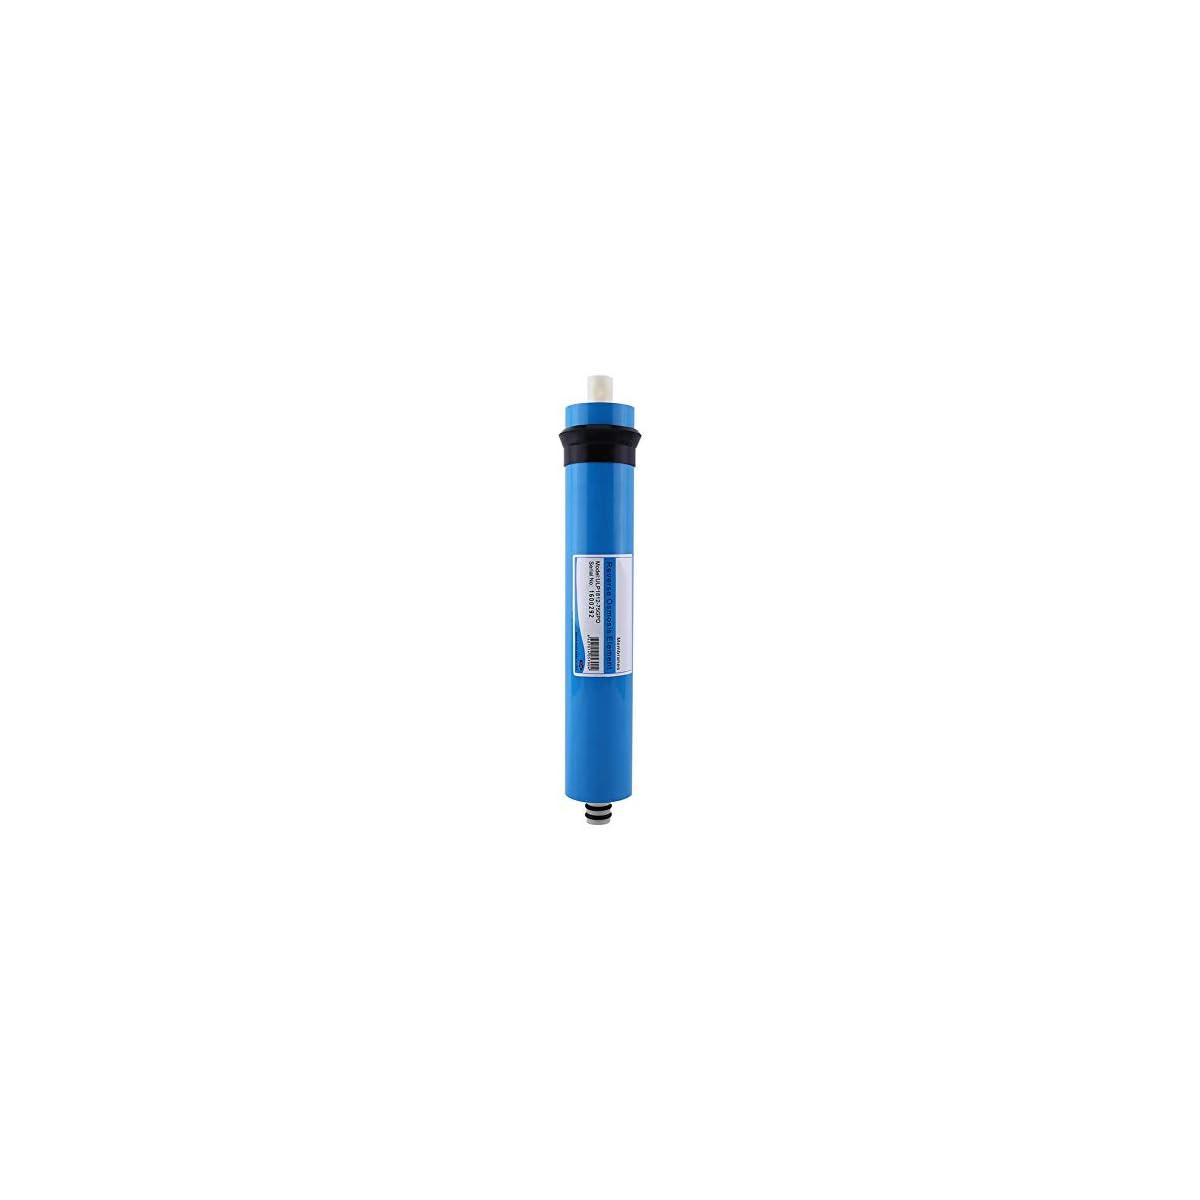 31jvdpv0m3L. SS1200  - Elemento De Ósmosis Inversa Elemento De Membrana Del Filtro De Agua UlP1812 - 75 GPD Anillo-herida Para Hogar Hogar Hospital Laboratorio Filtros de Reemplazo Filtros Azules